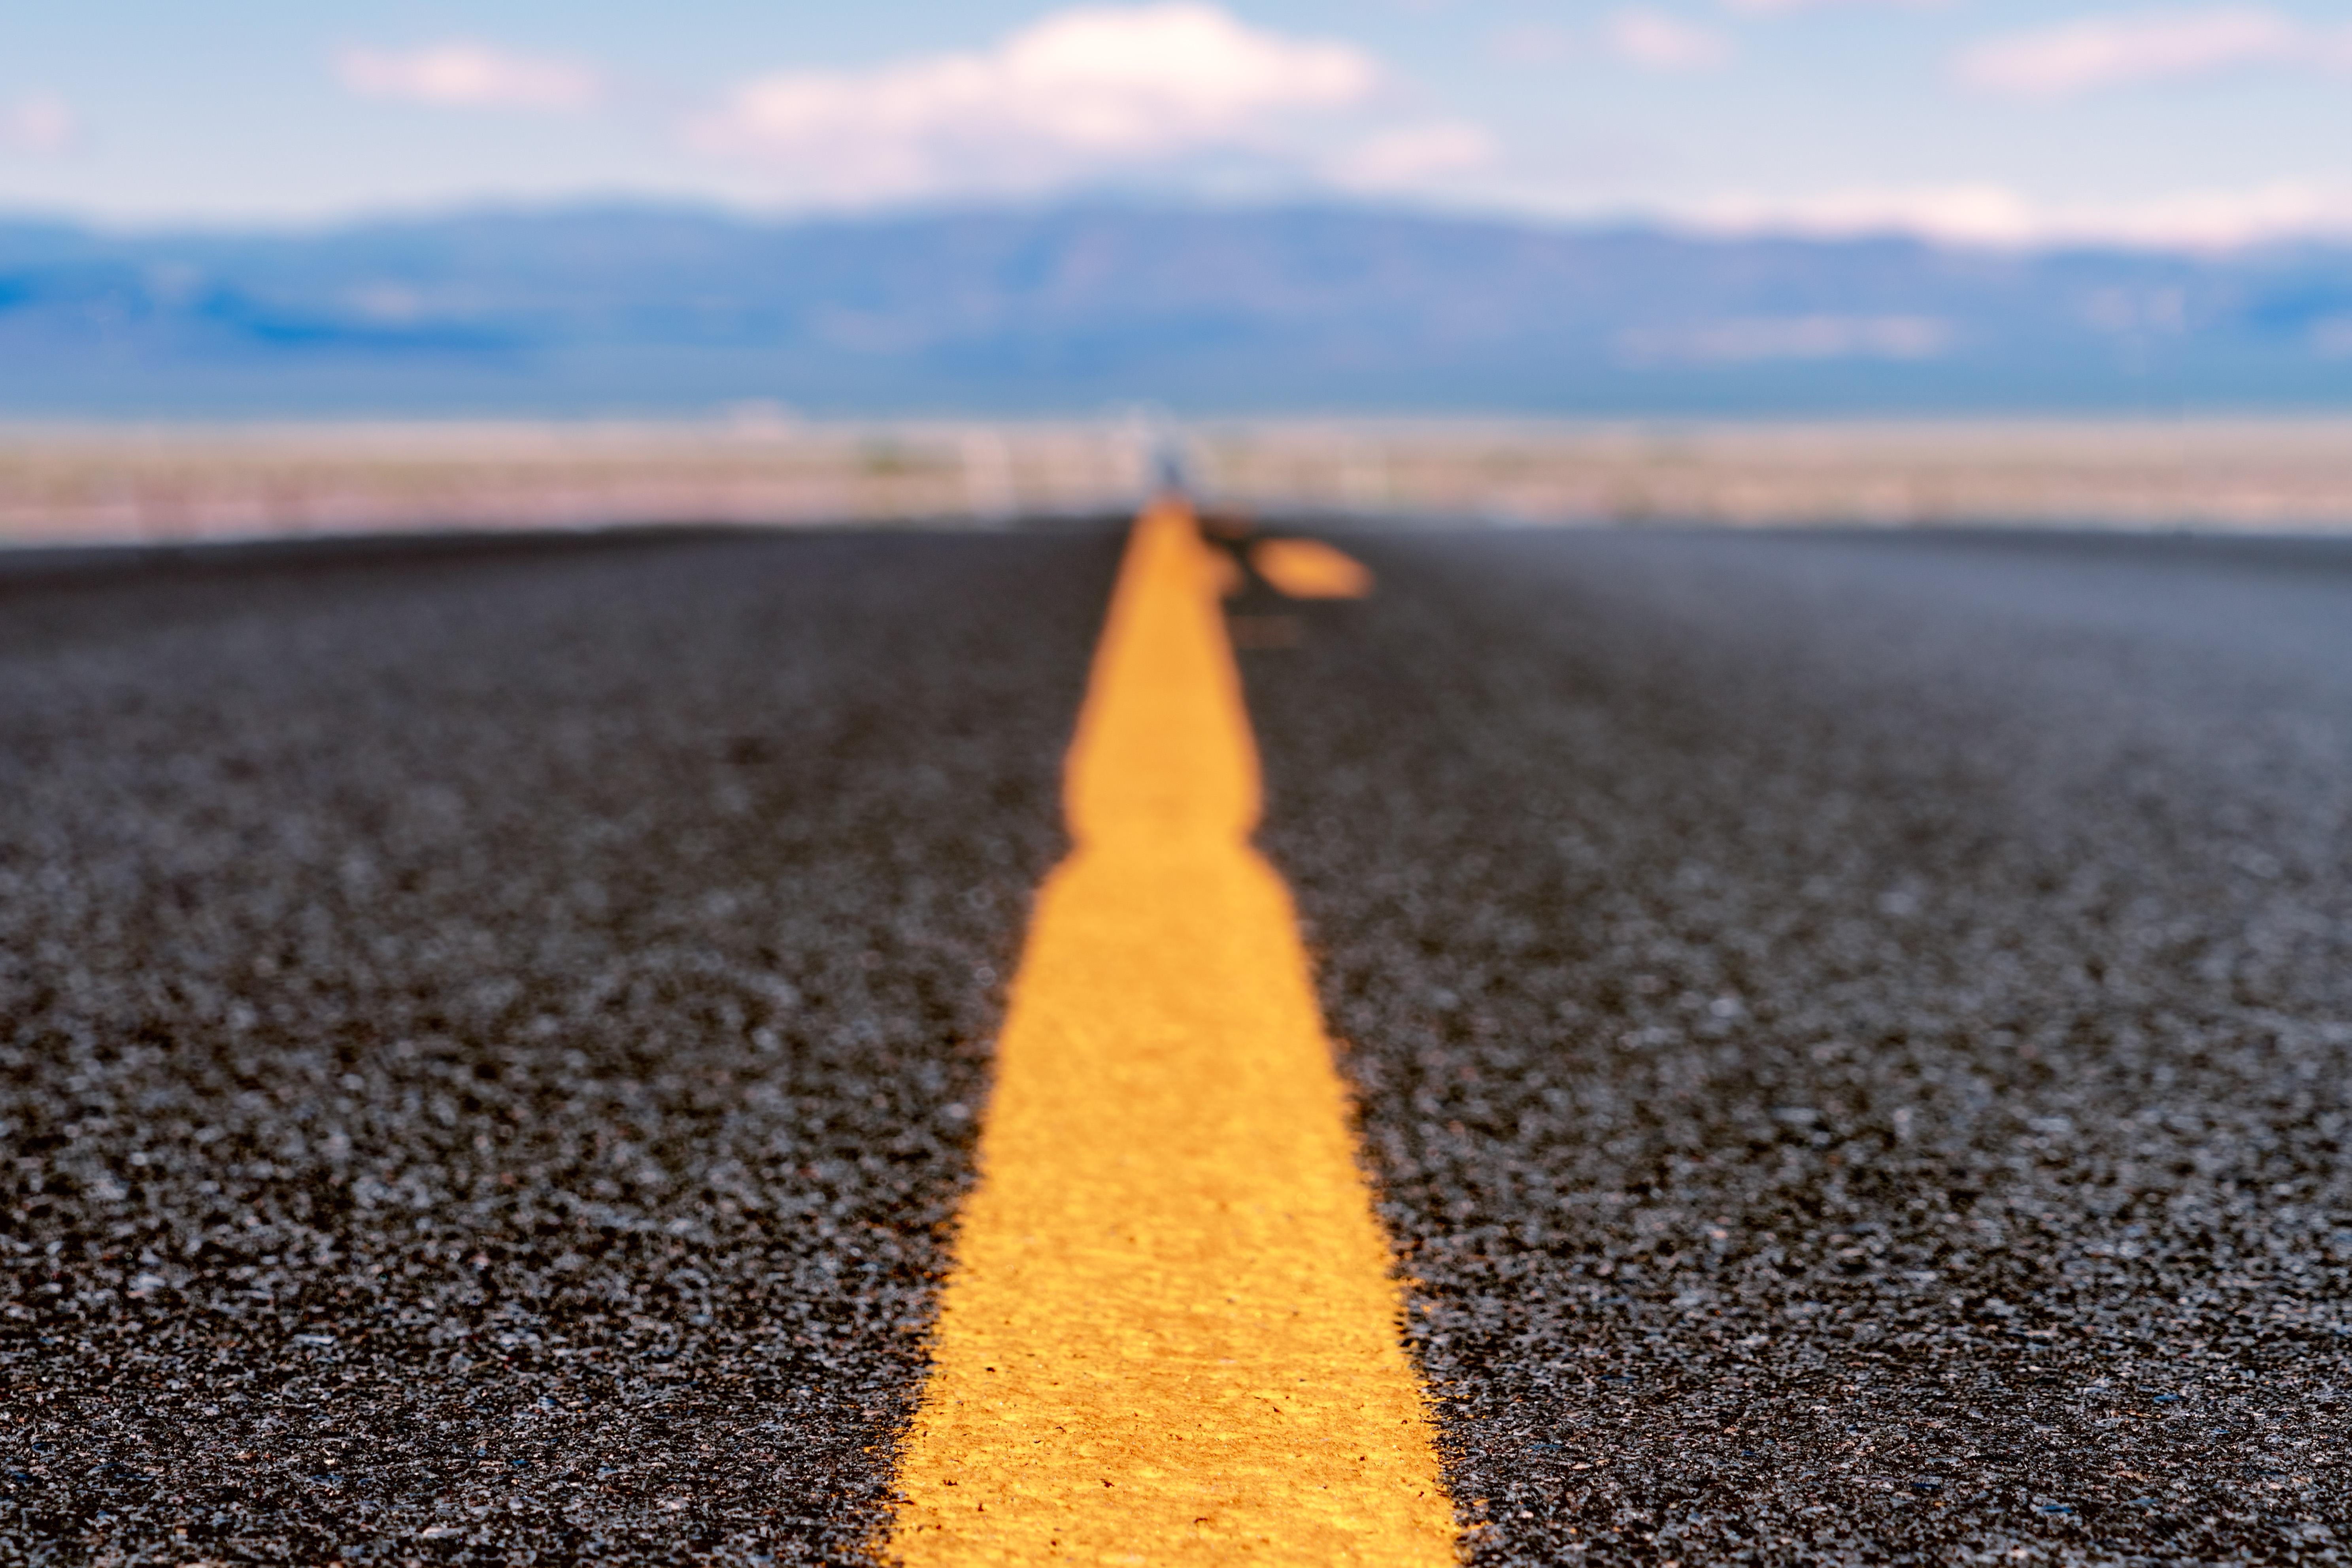 Selective Focus Photo of Asphalt Road